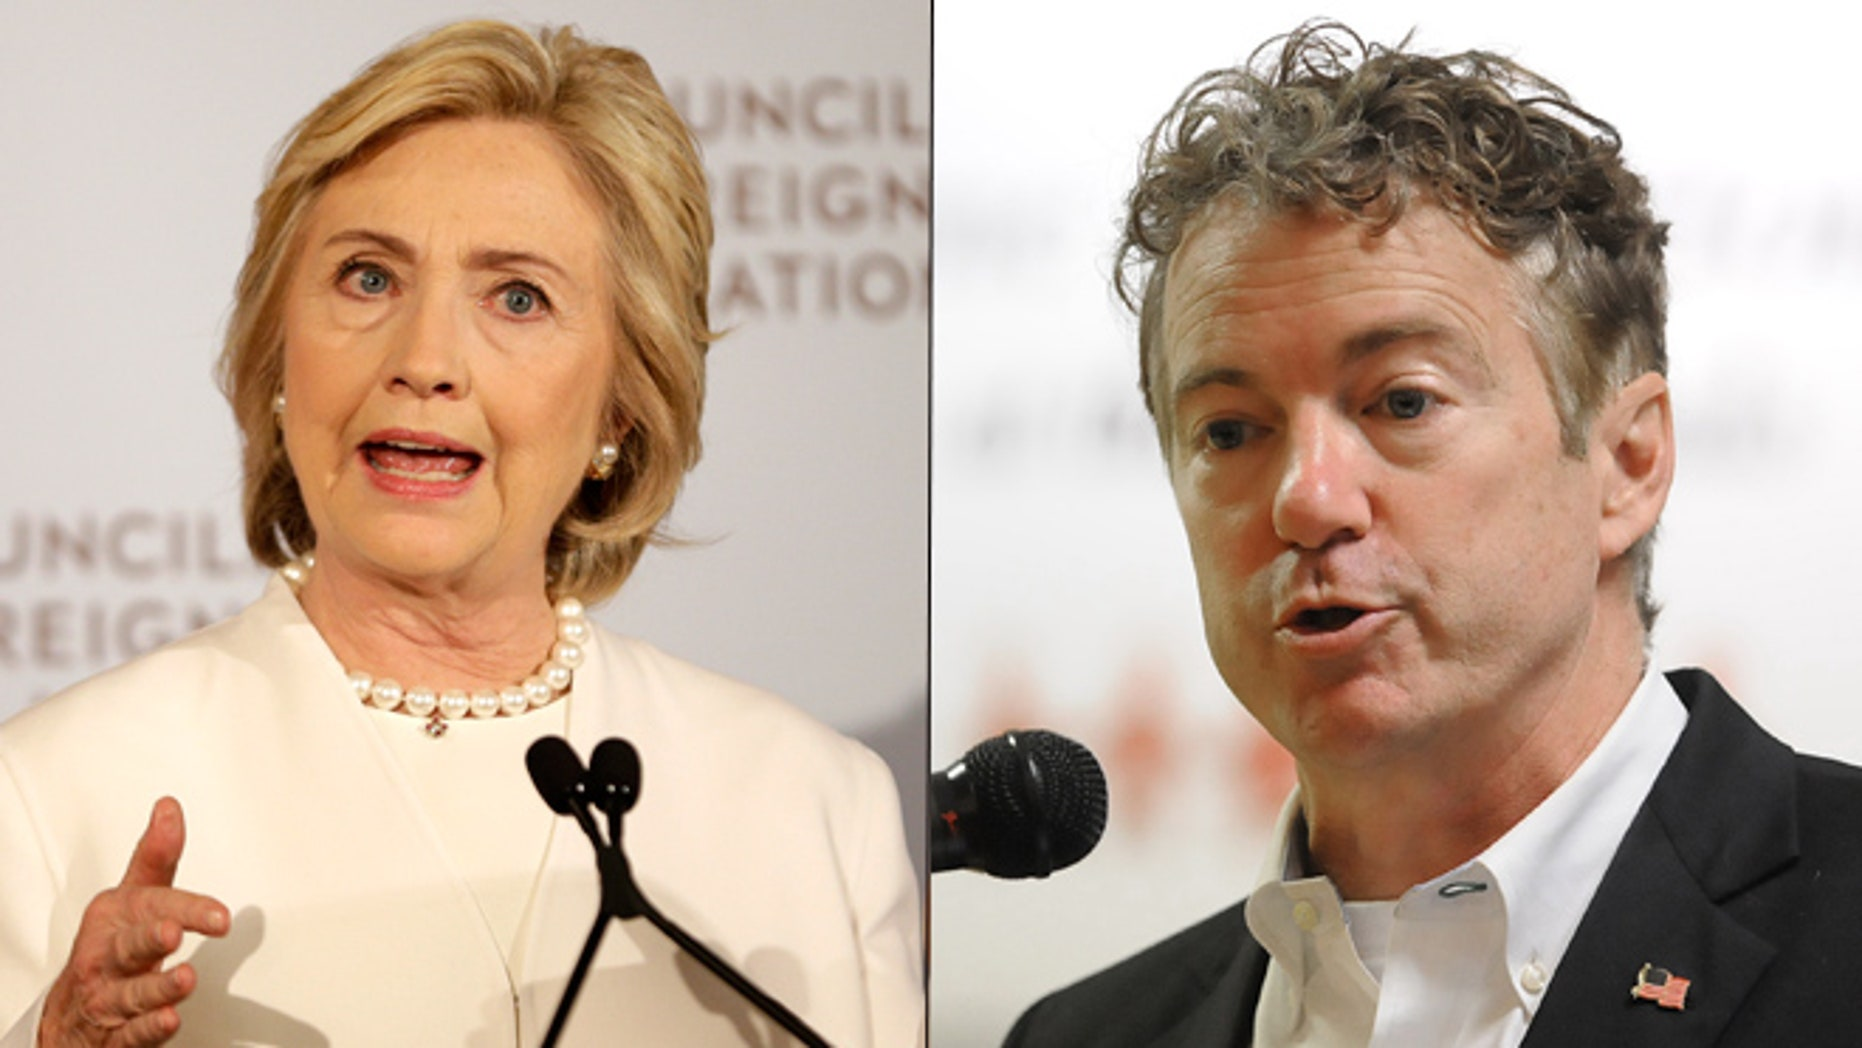 At left, Hillary Clinton; at right, Sen. Rand Paul (AP)